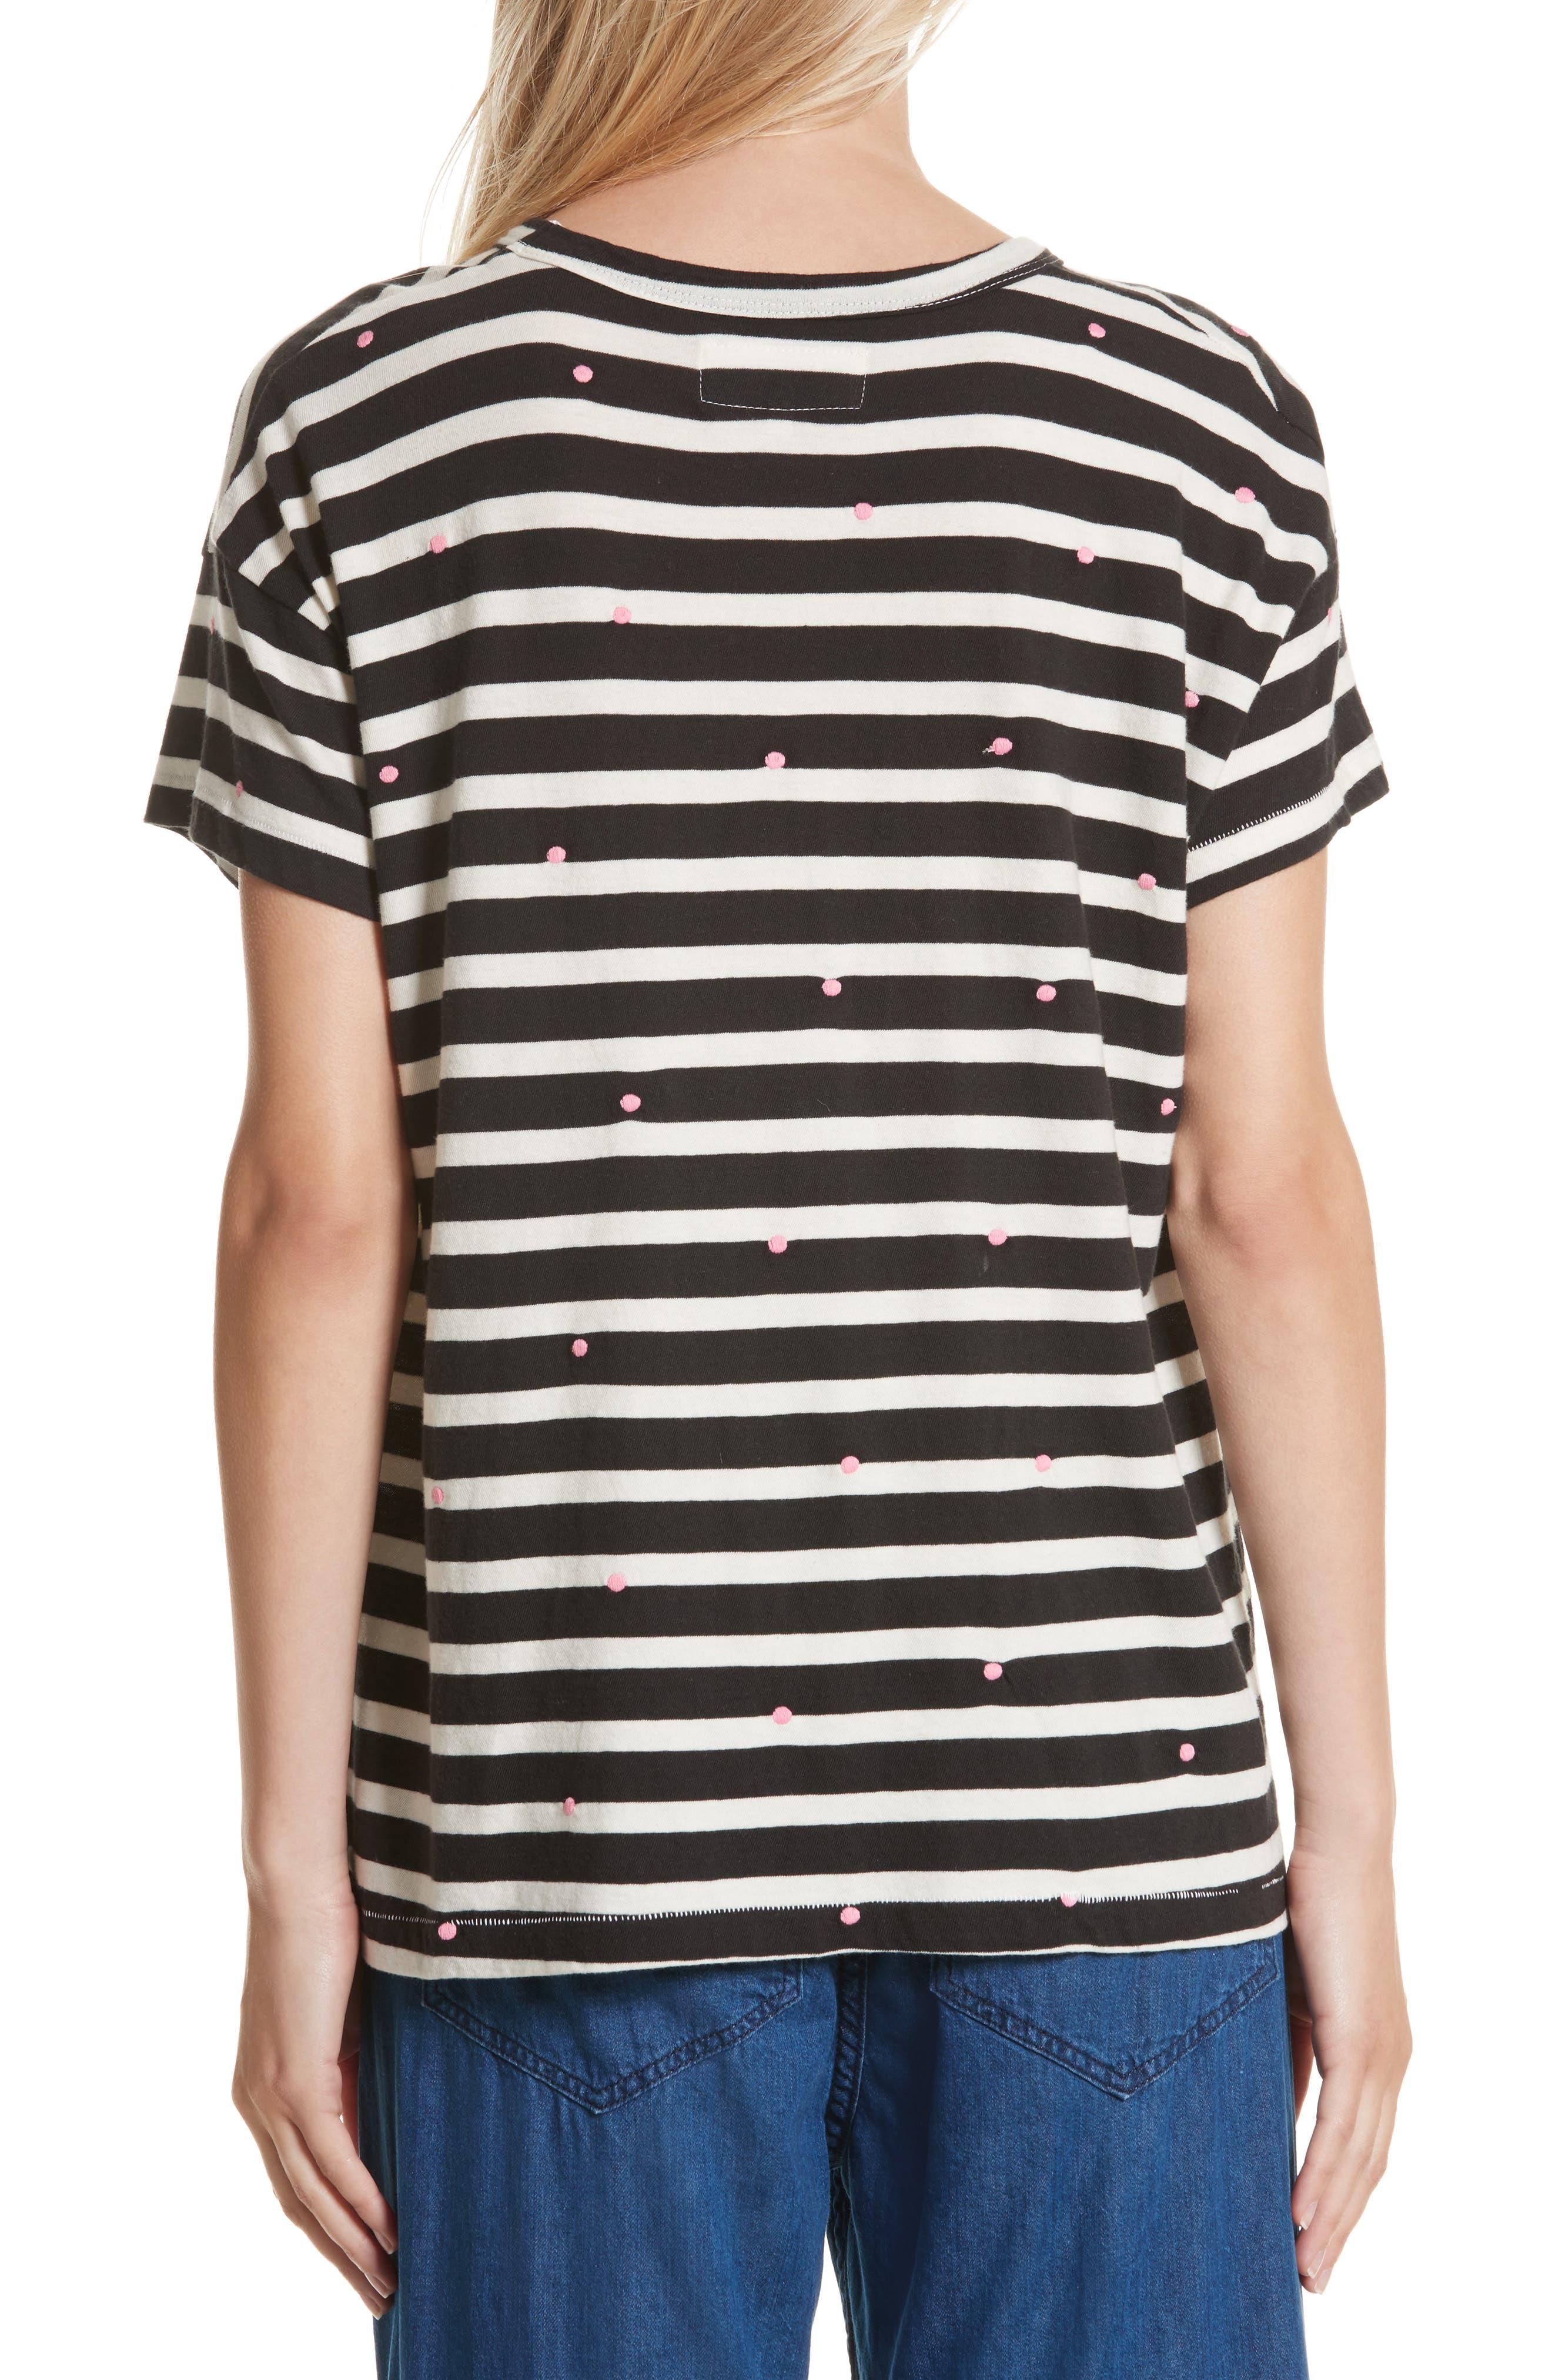 The Boxy Crew Embroidered Dot Tee,                             Alternate thumbnail 3, color,                             Black/ Cream Stripe